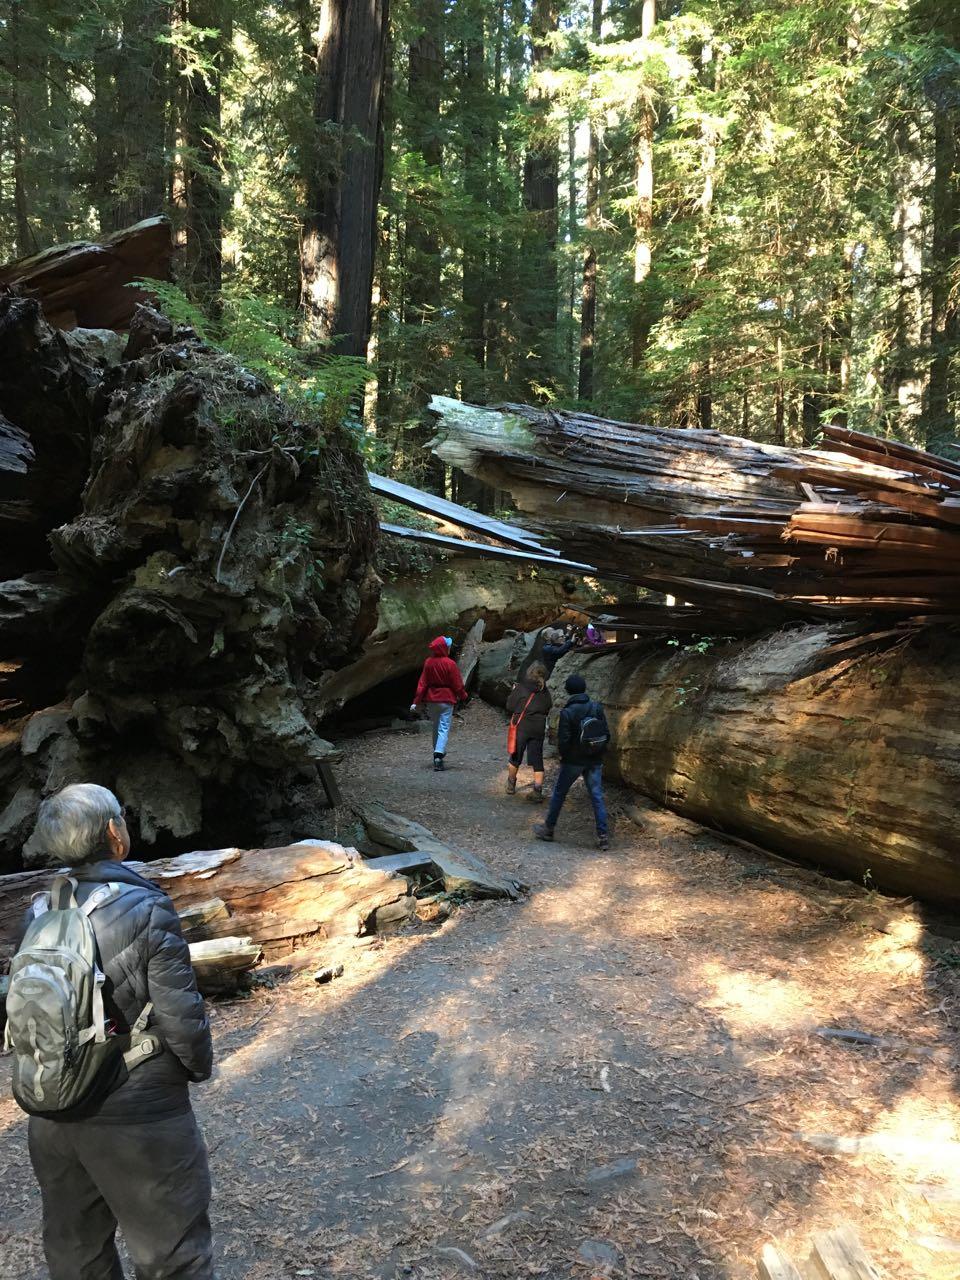 Redwoods 2017 10 08 22 Of 287